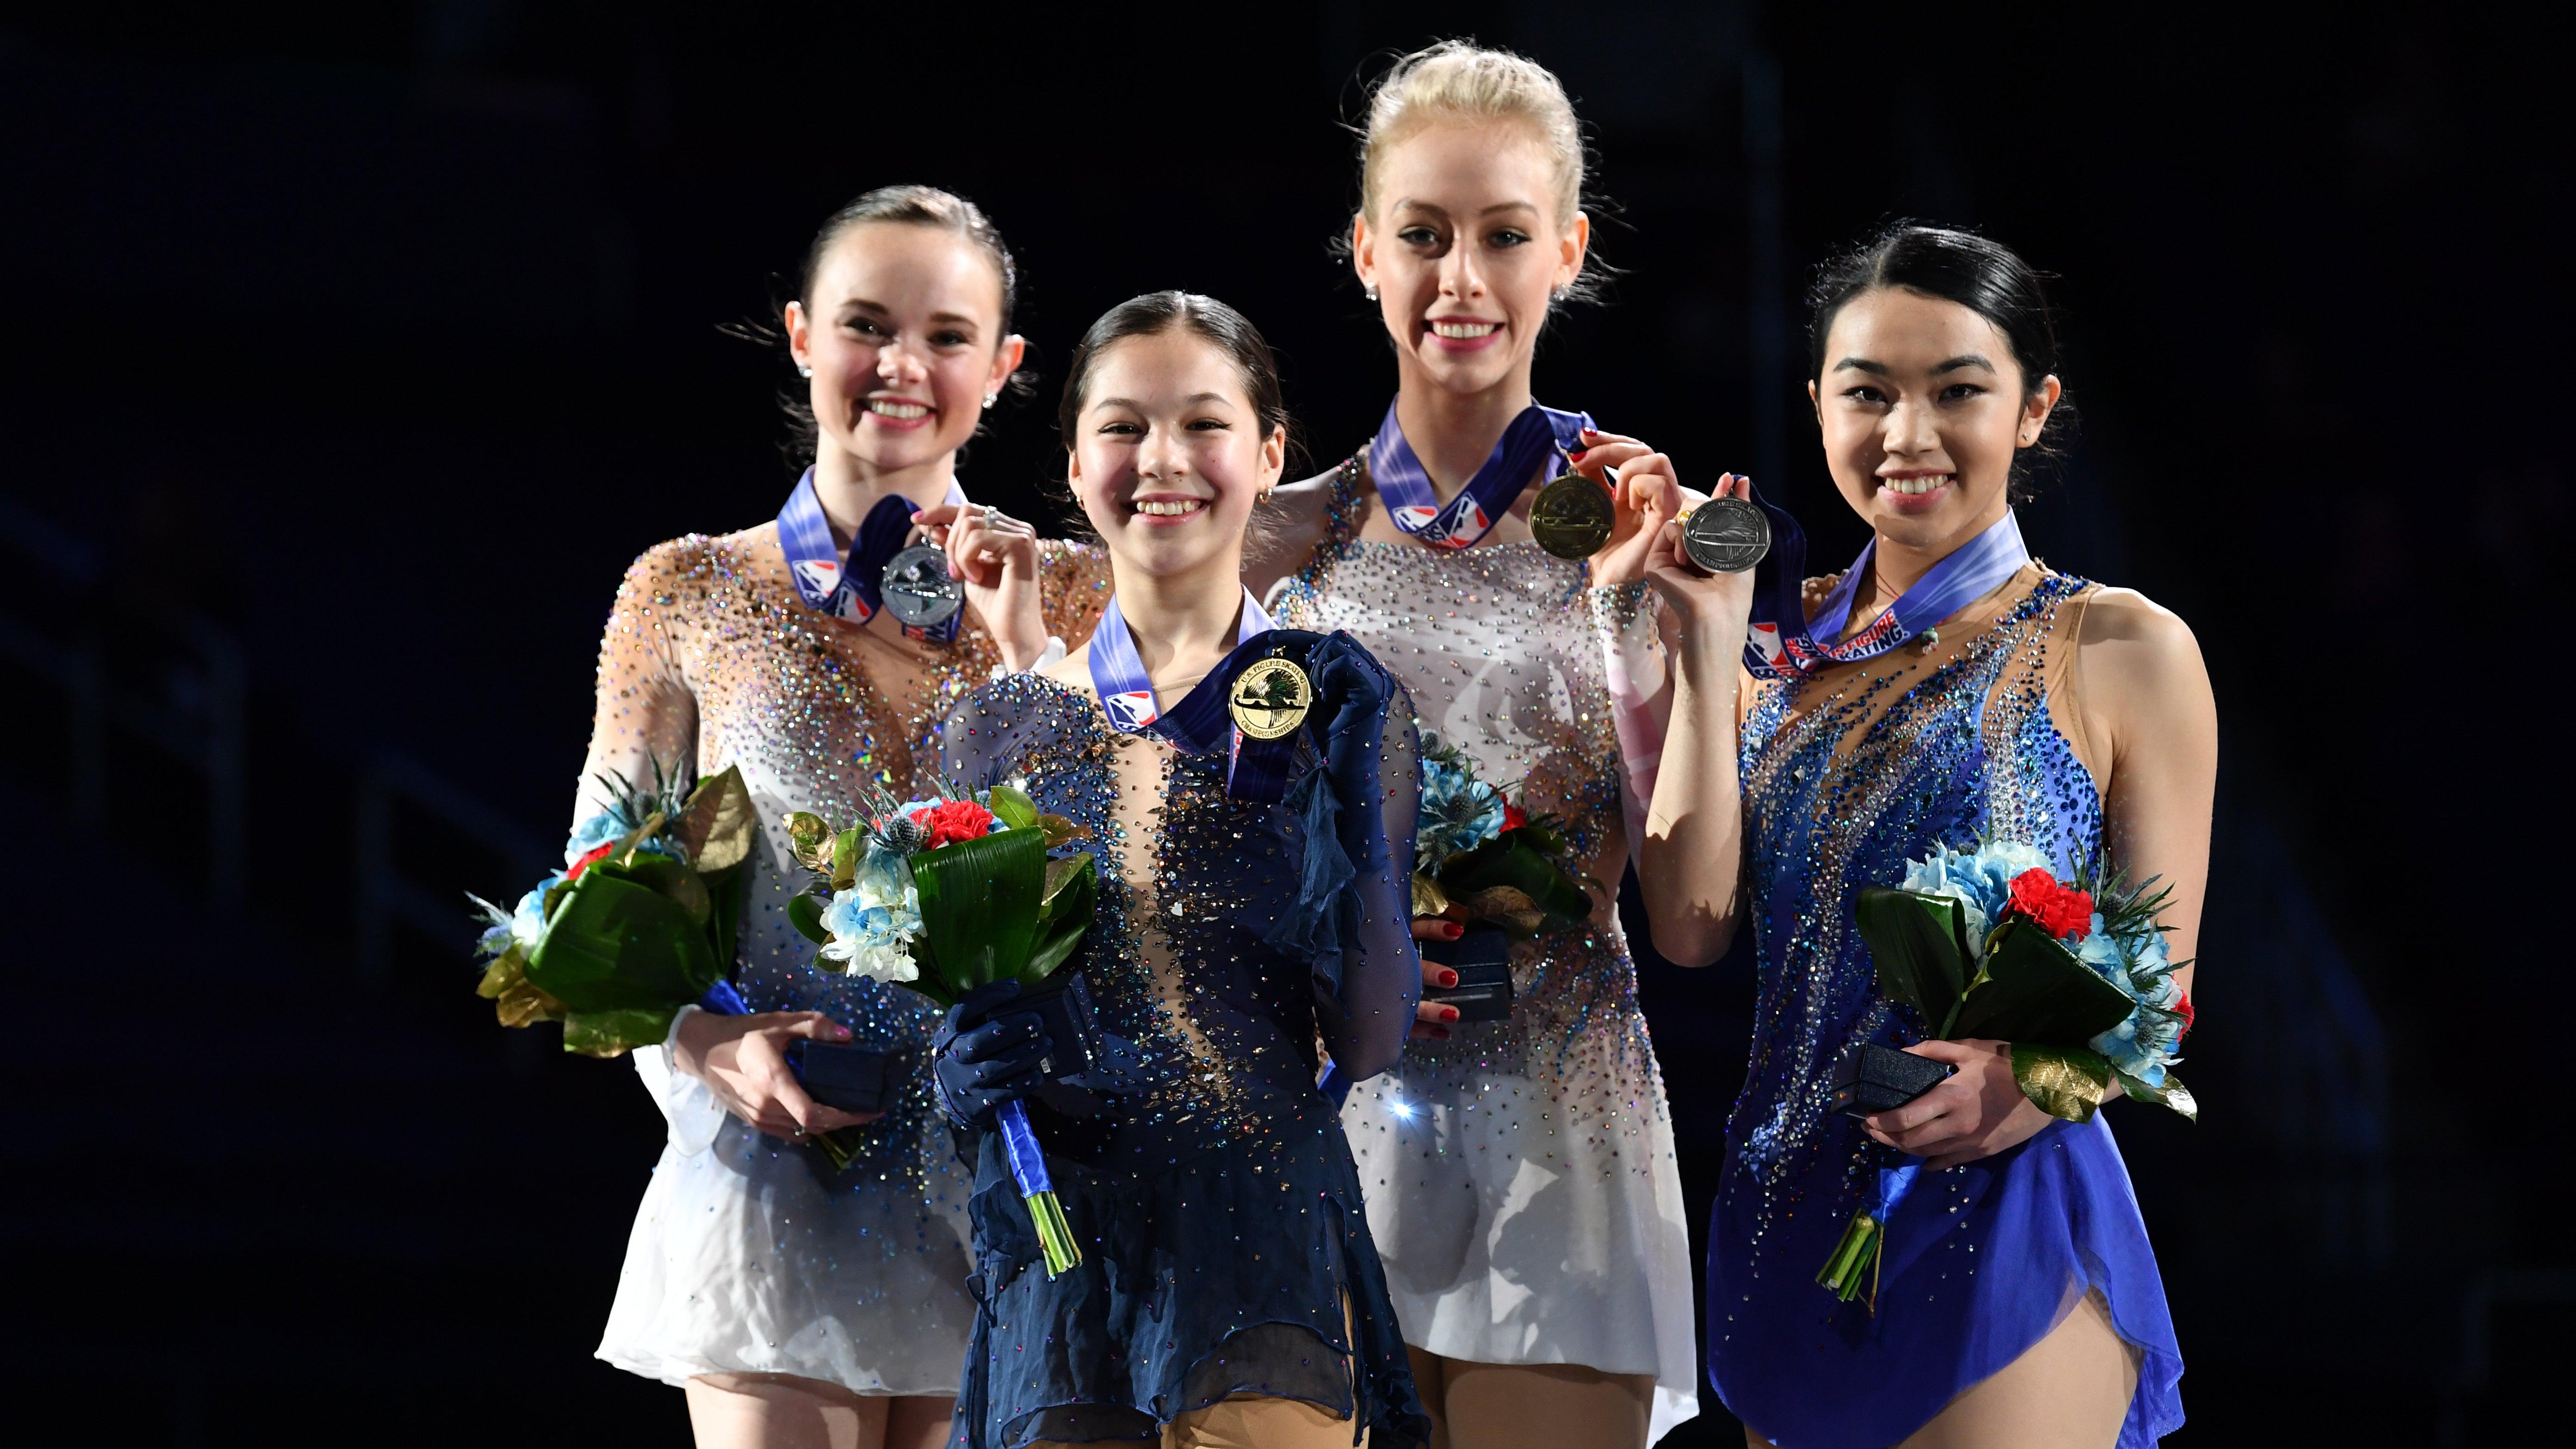 Championship Ladies Medalists - 2020 Toyota U.S. Figure Skating Championships